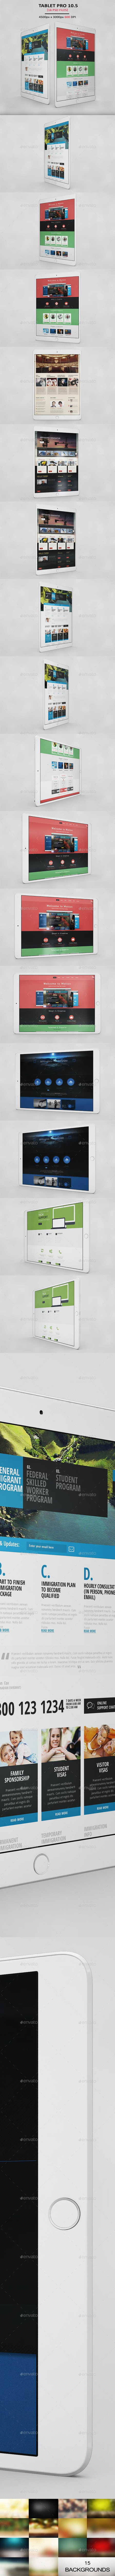 GraphicRiver Tablet Pro 10.5 App MockUp 2017 Vol1 20363742